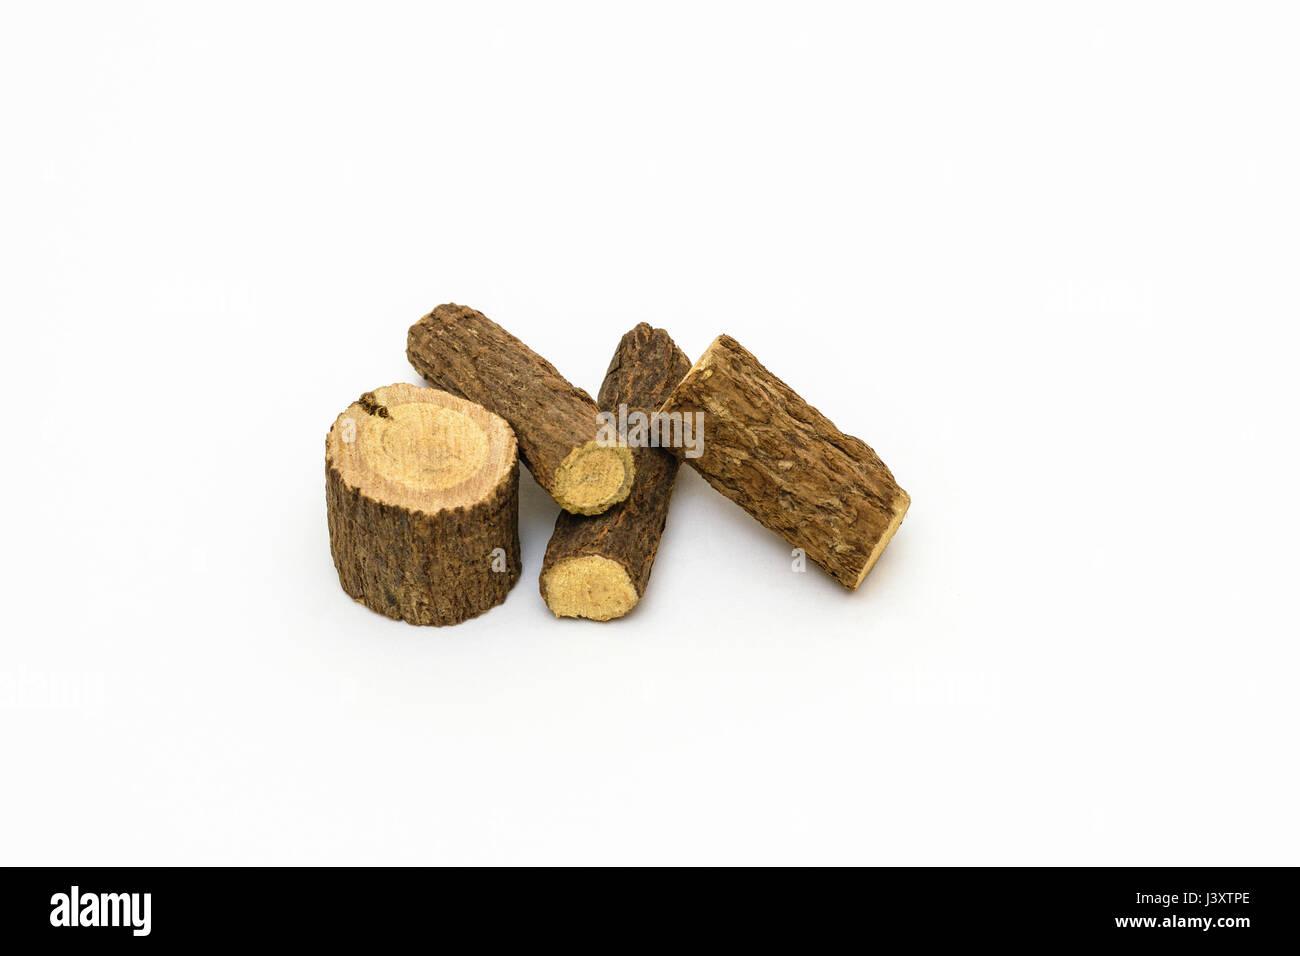 Dried sticks of Licorice or Liquorice (Glycyrrhiza glabra) root - Stock Image